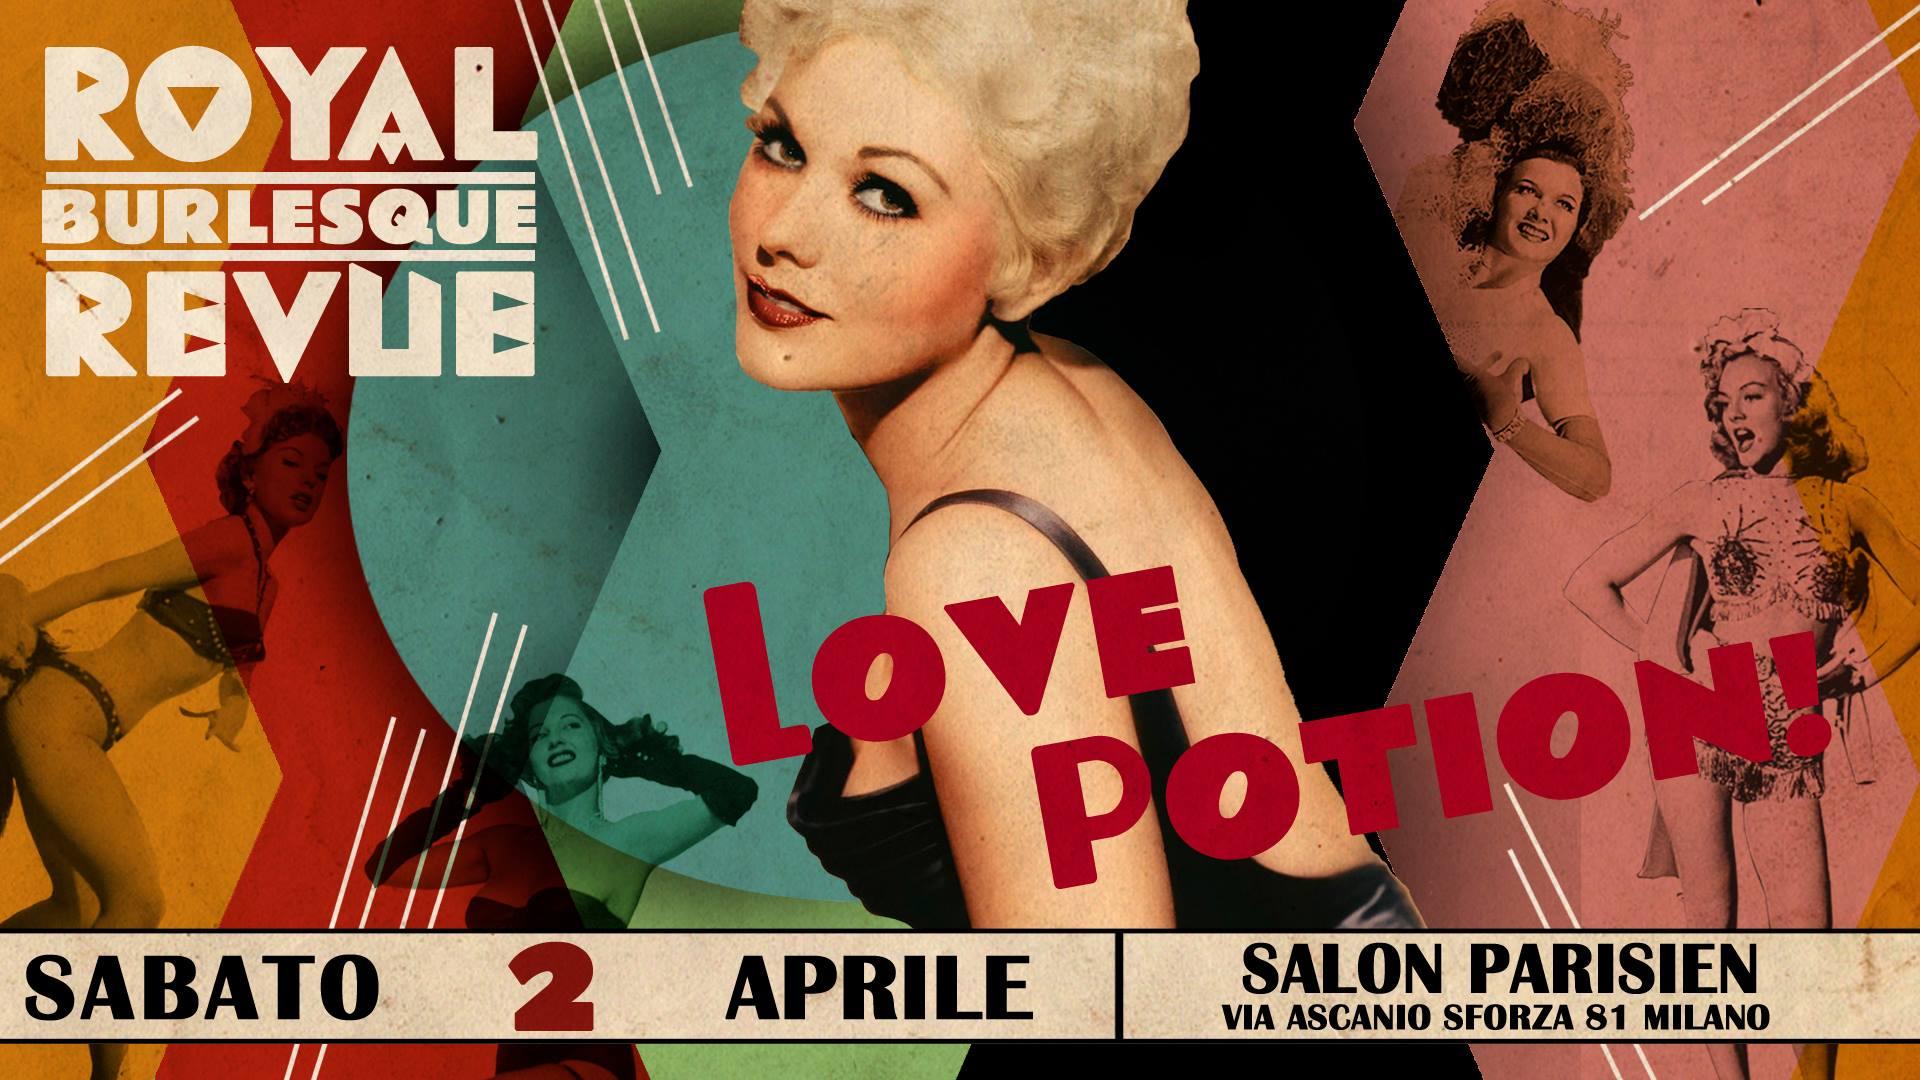 Love poison royale burlesque revue Milano